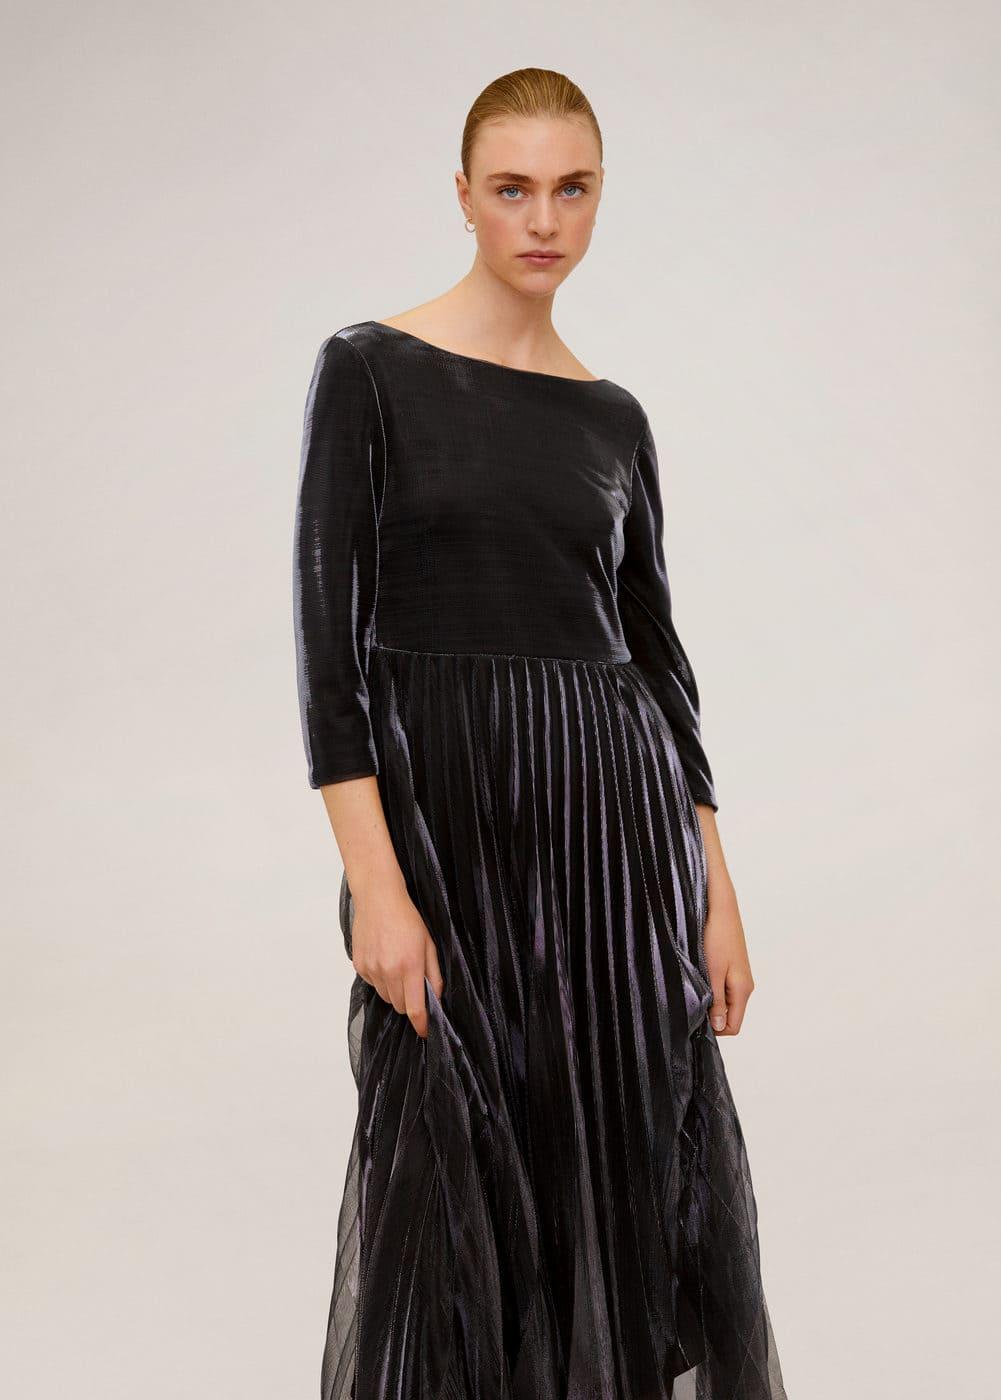 m-breeze-a:vestido plisado metalizado